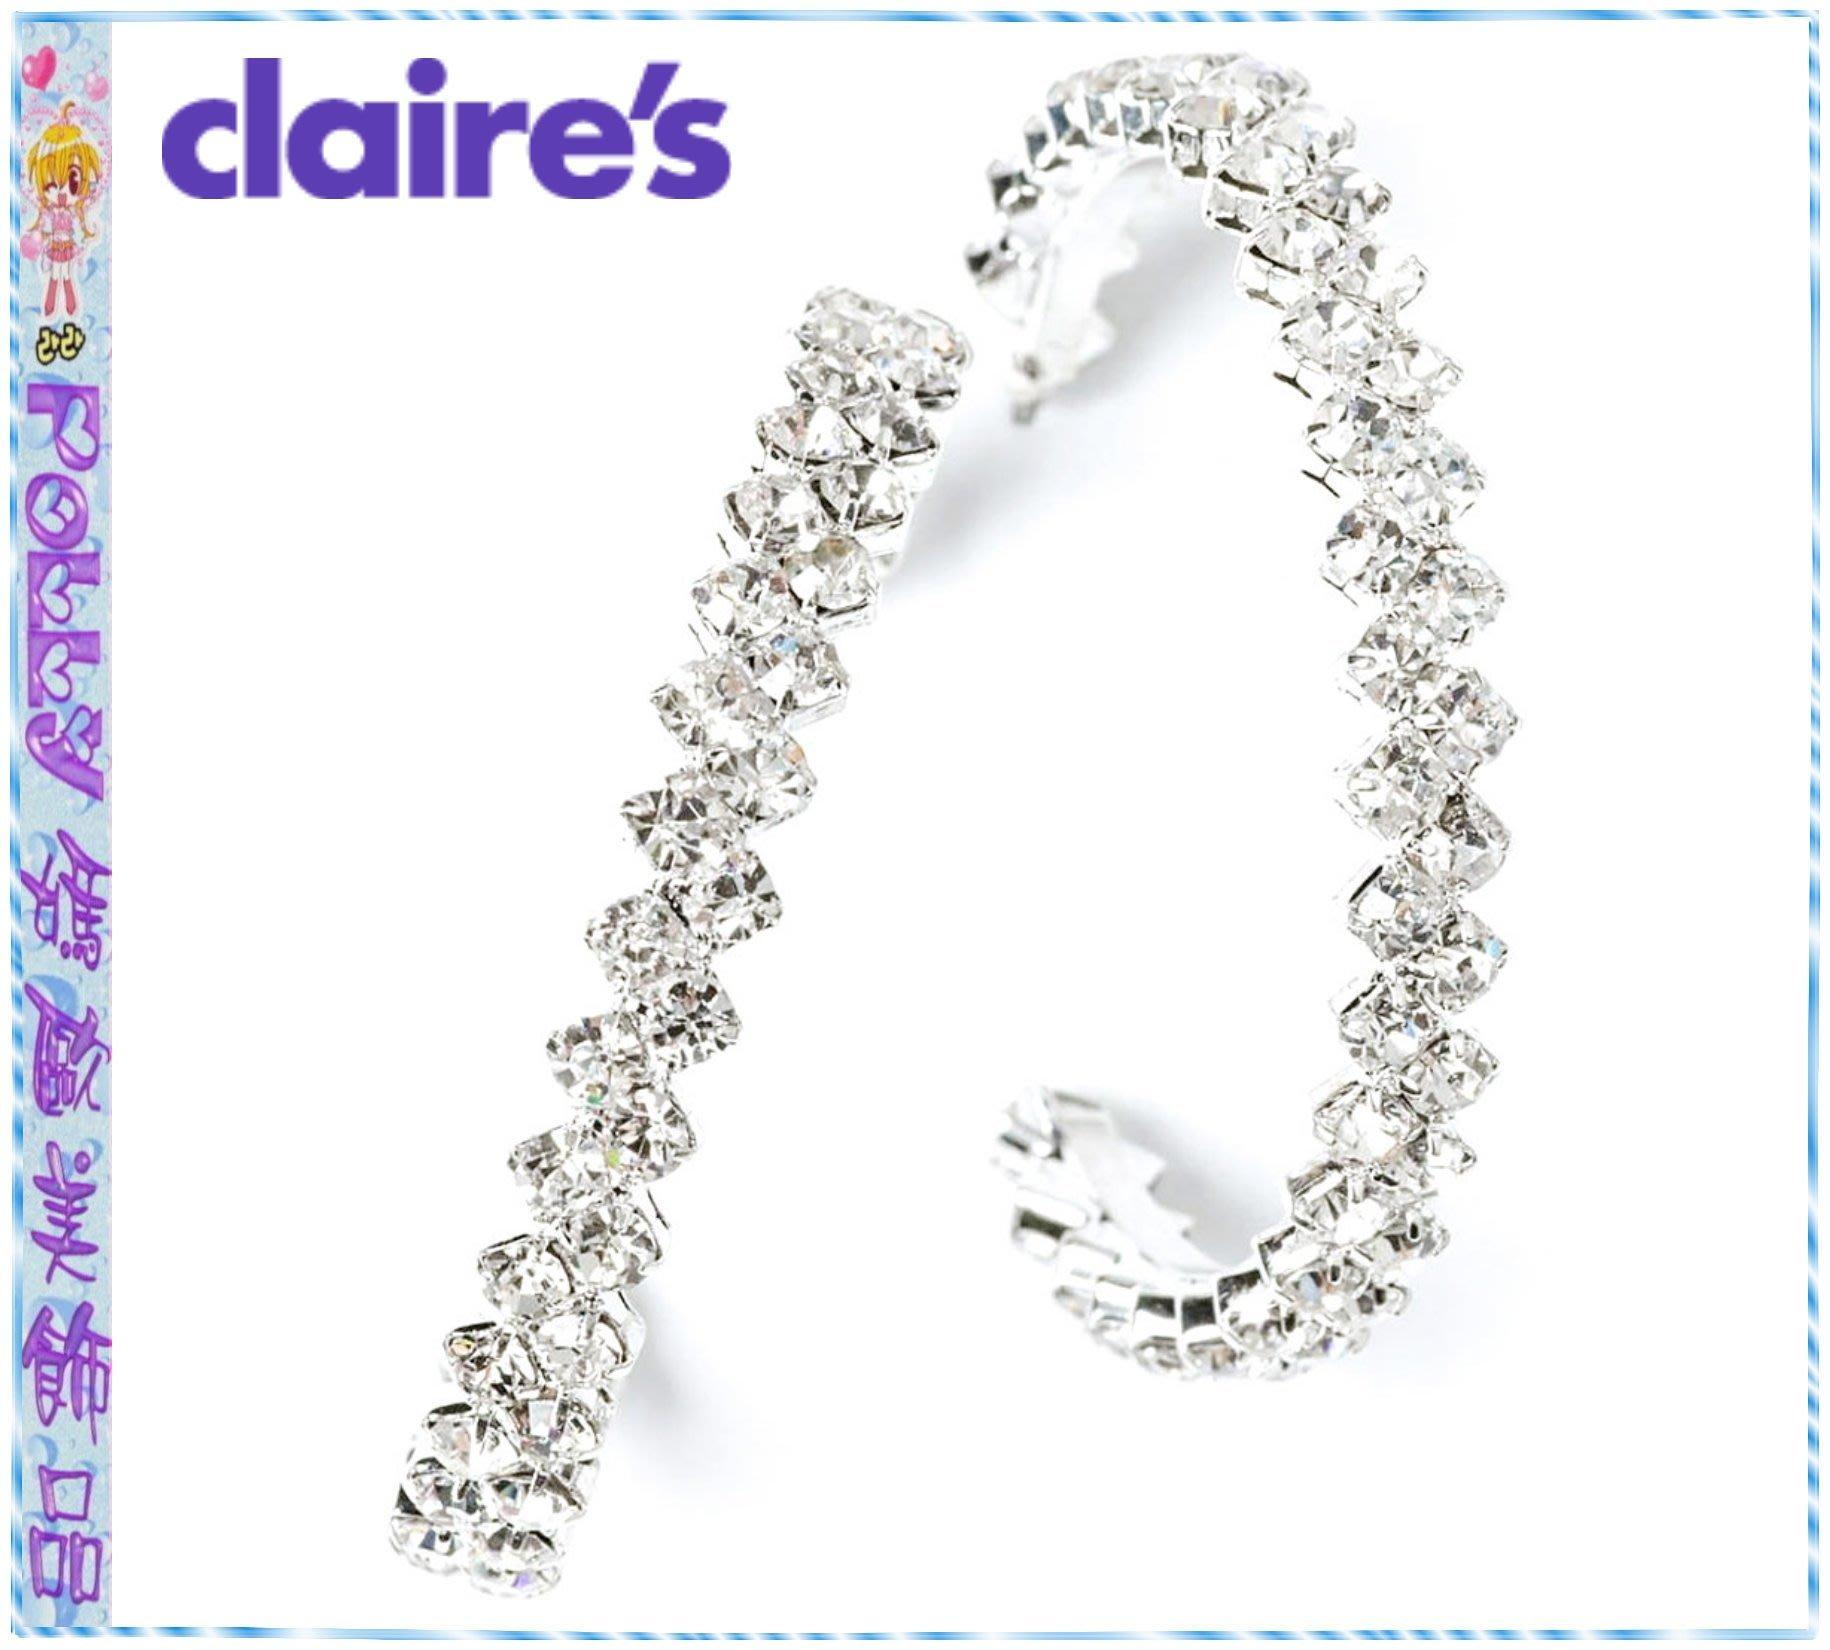 ☆POLLY媽☆歐美claires Zig Zag Crystal Hoop Earring水晶鑽大圈圈耳環£8.00